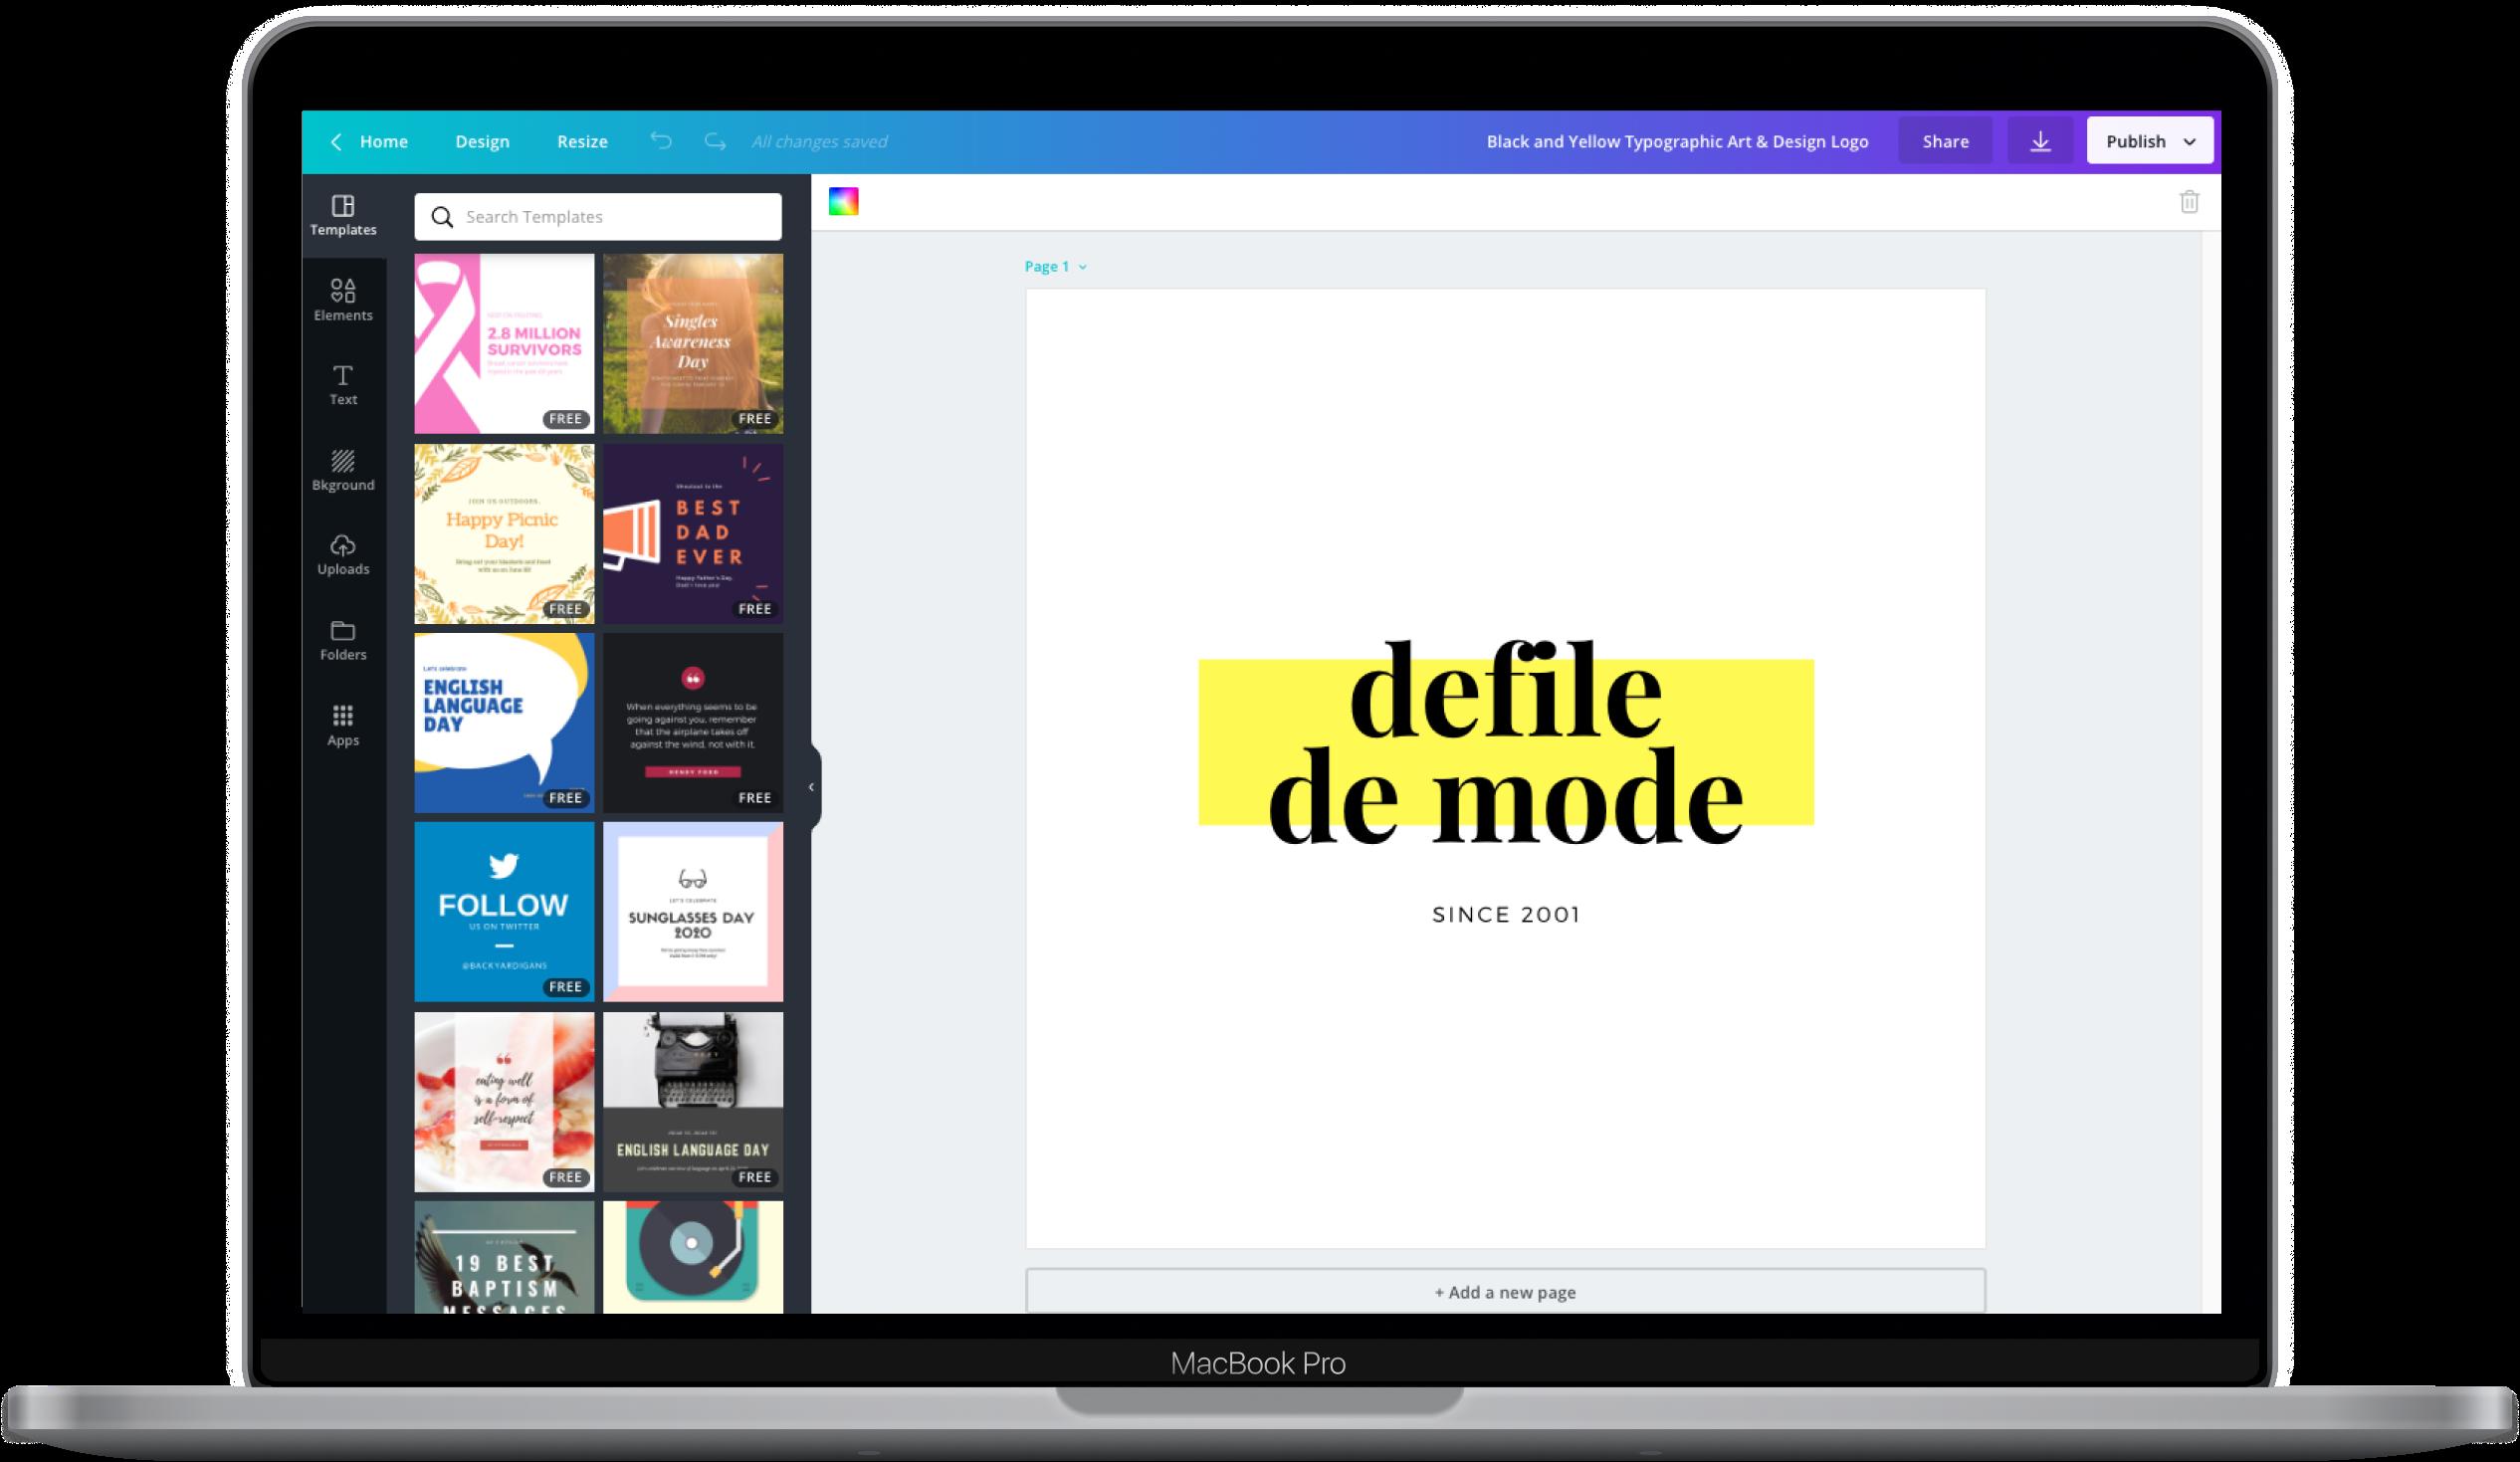 Canva editor showing a logo design